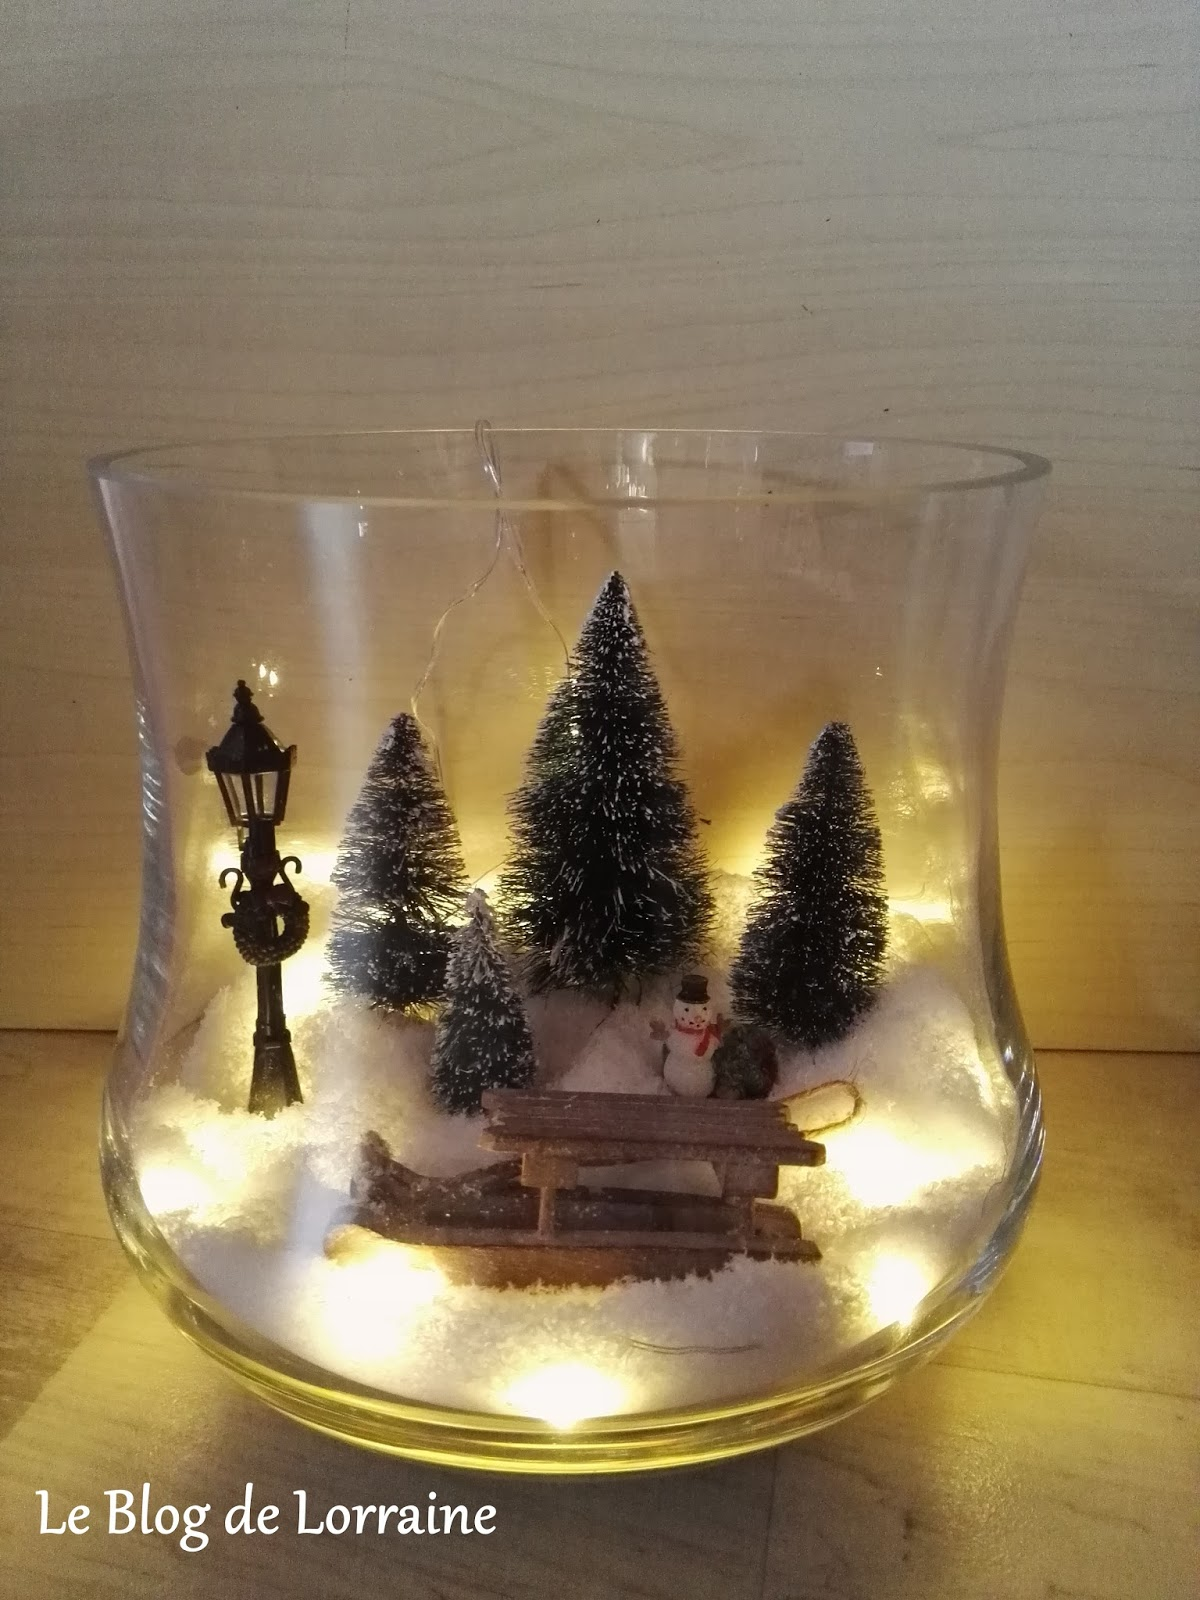 #9C8A2F Le Blog De Lorraine: DiY: Vase Et Cloches De Noël 7054 Deco De Noel Qui Se Mangent 1200x1600 px @ aertt.com